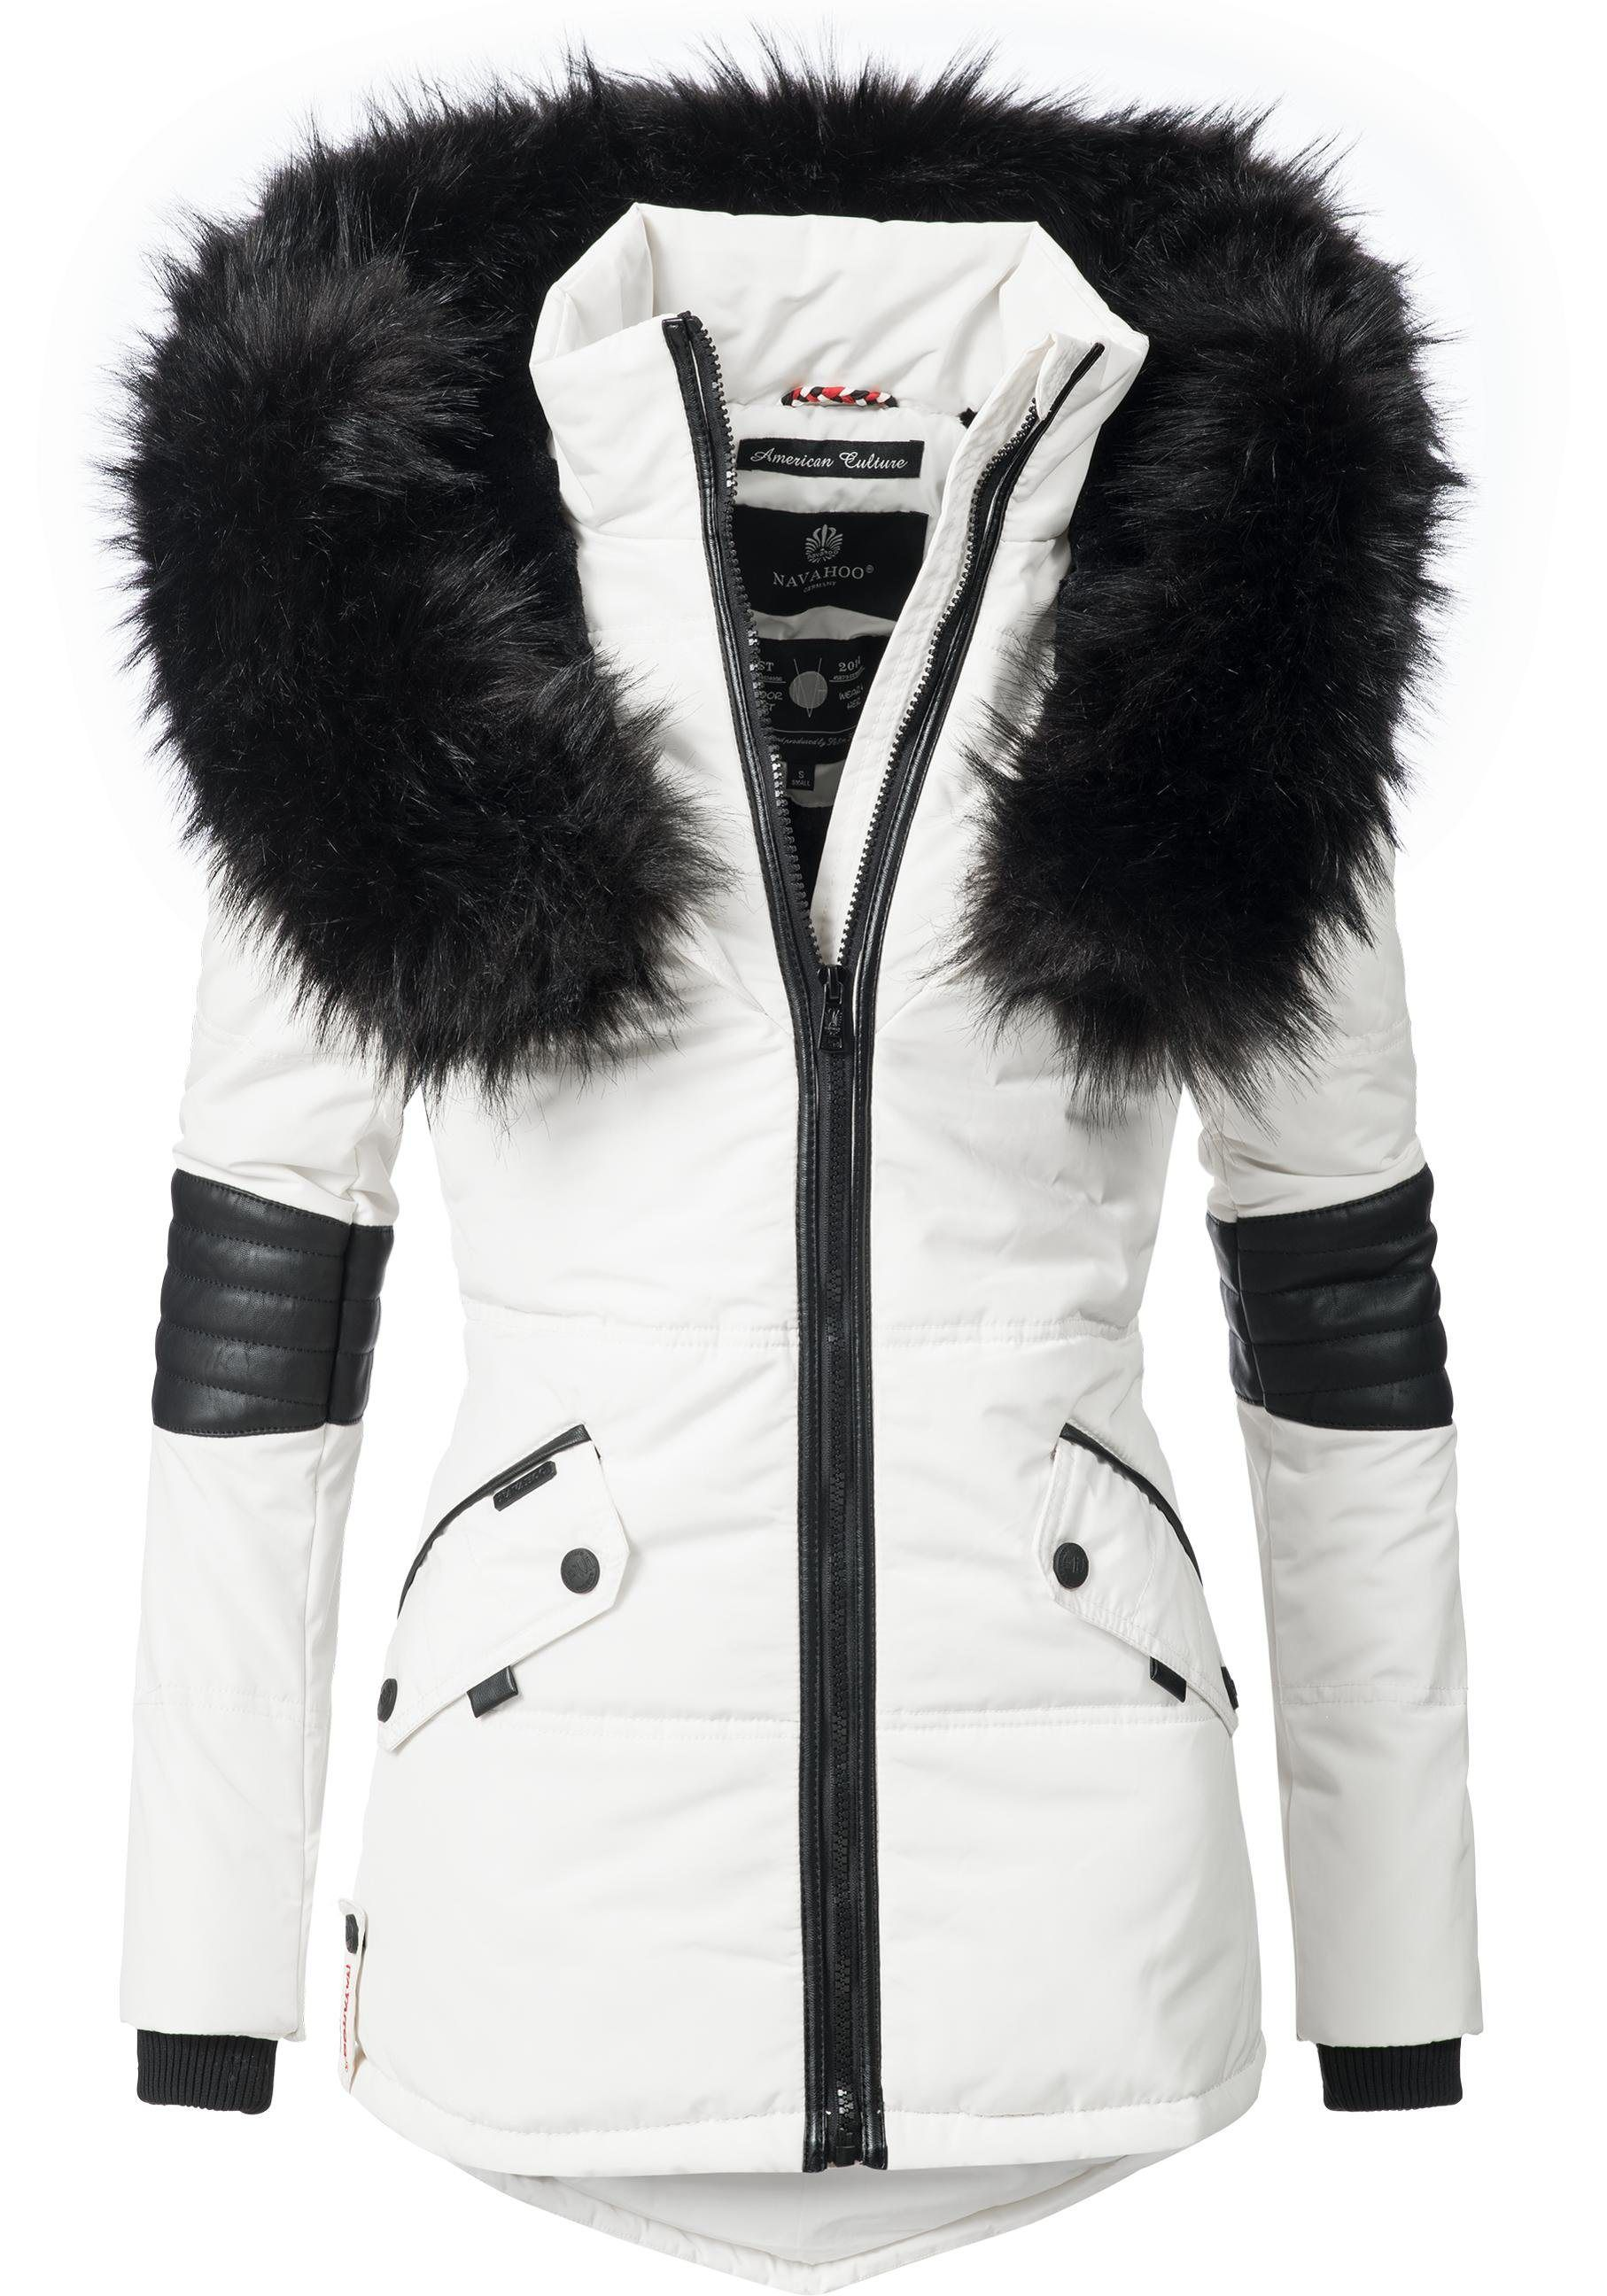 OTTO  Navahoo  Bekleidung  Blazer  Jacken  Steppjacken  Winterjacken  Damen d9dde8a500